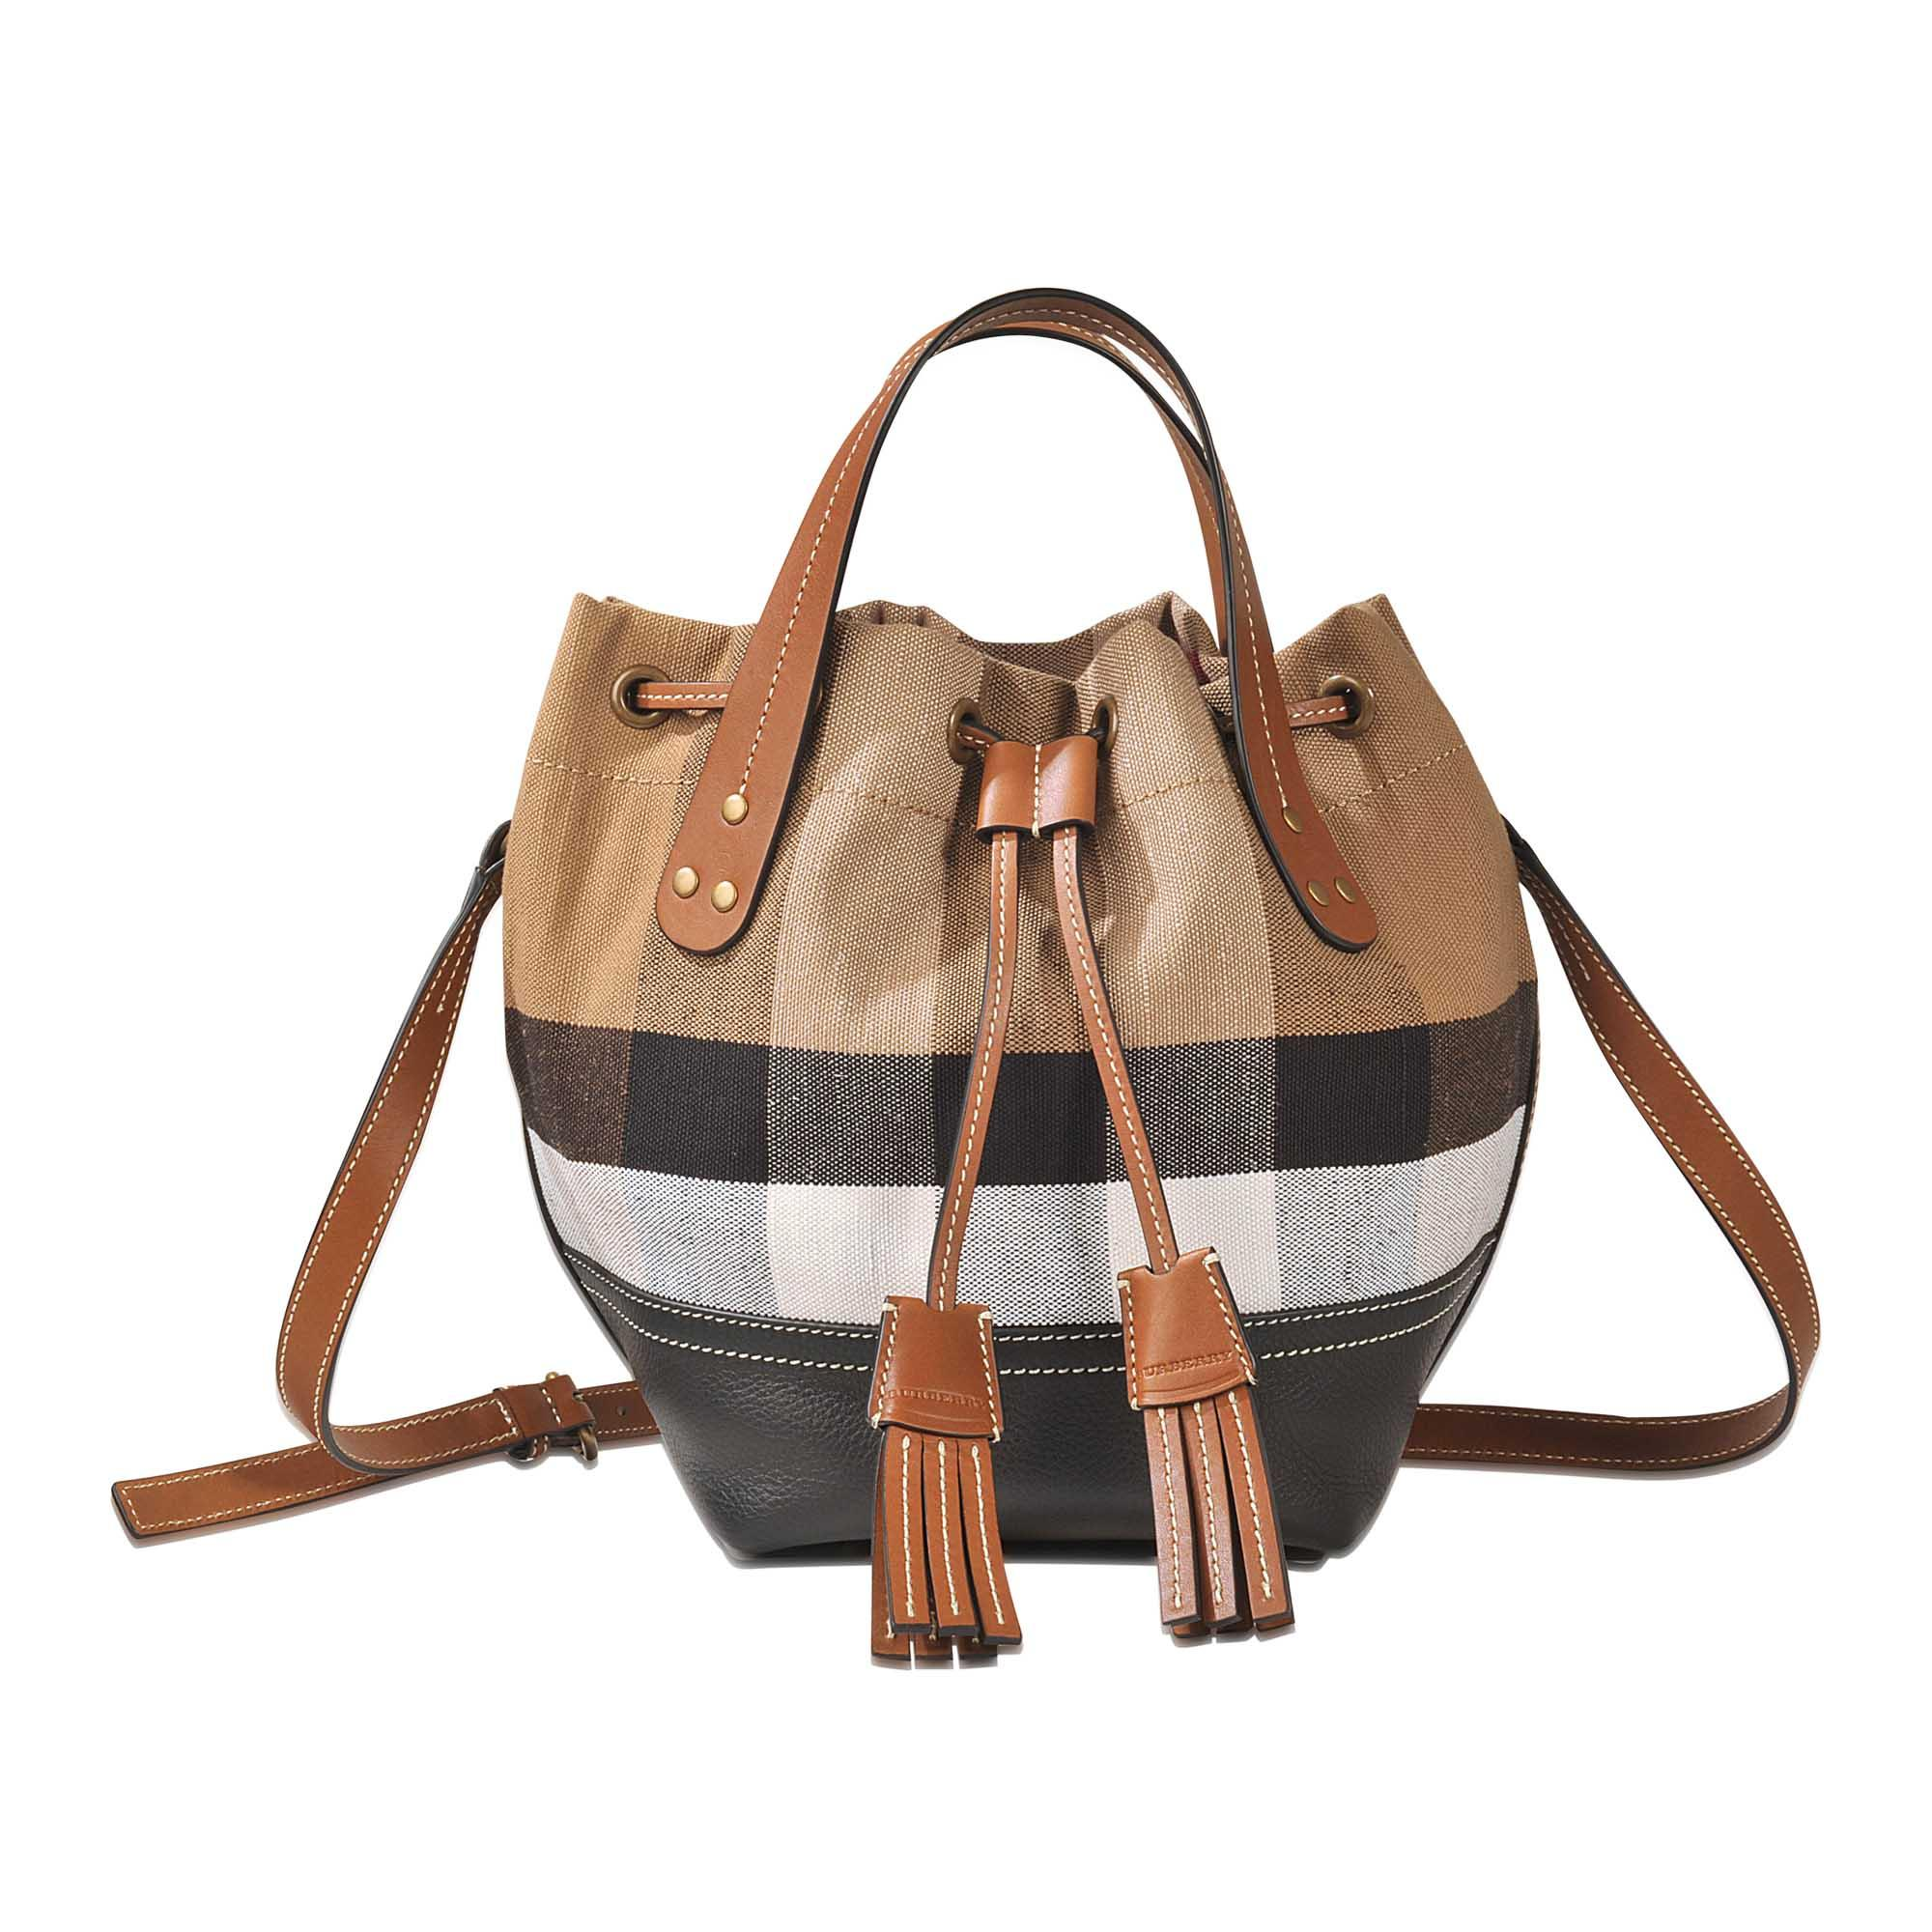 aebbc0f247b5 Keeping Burberry Small Bags  Burberry boston small smoked check bag ...